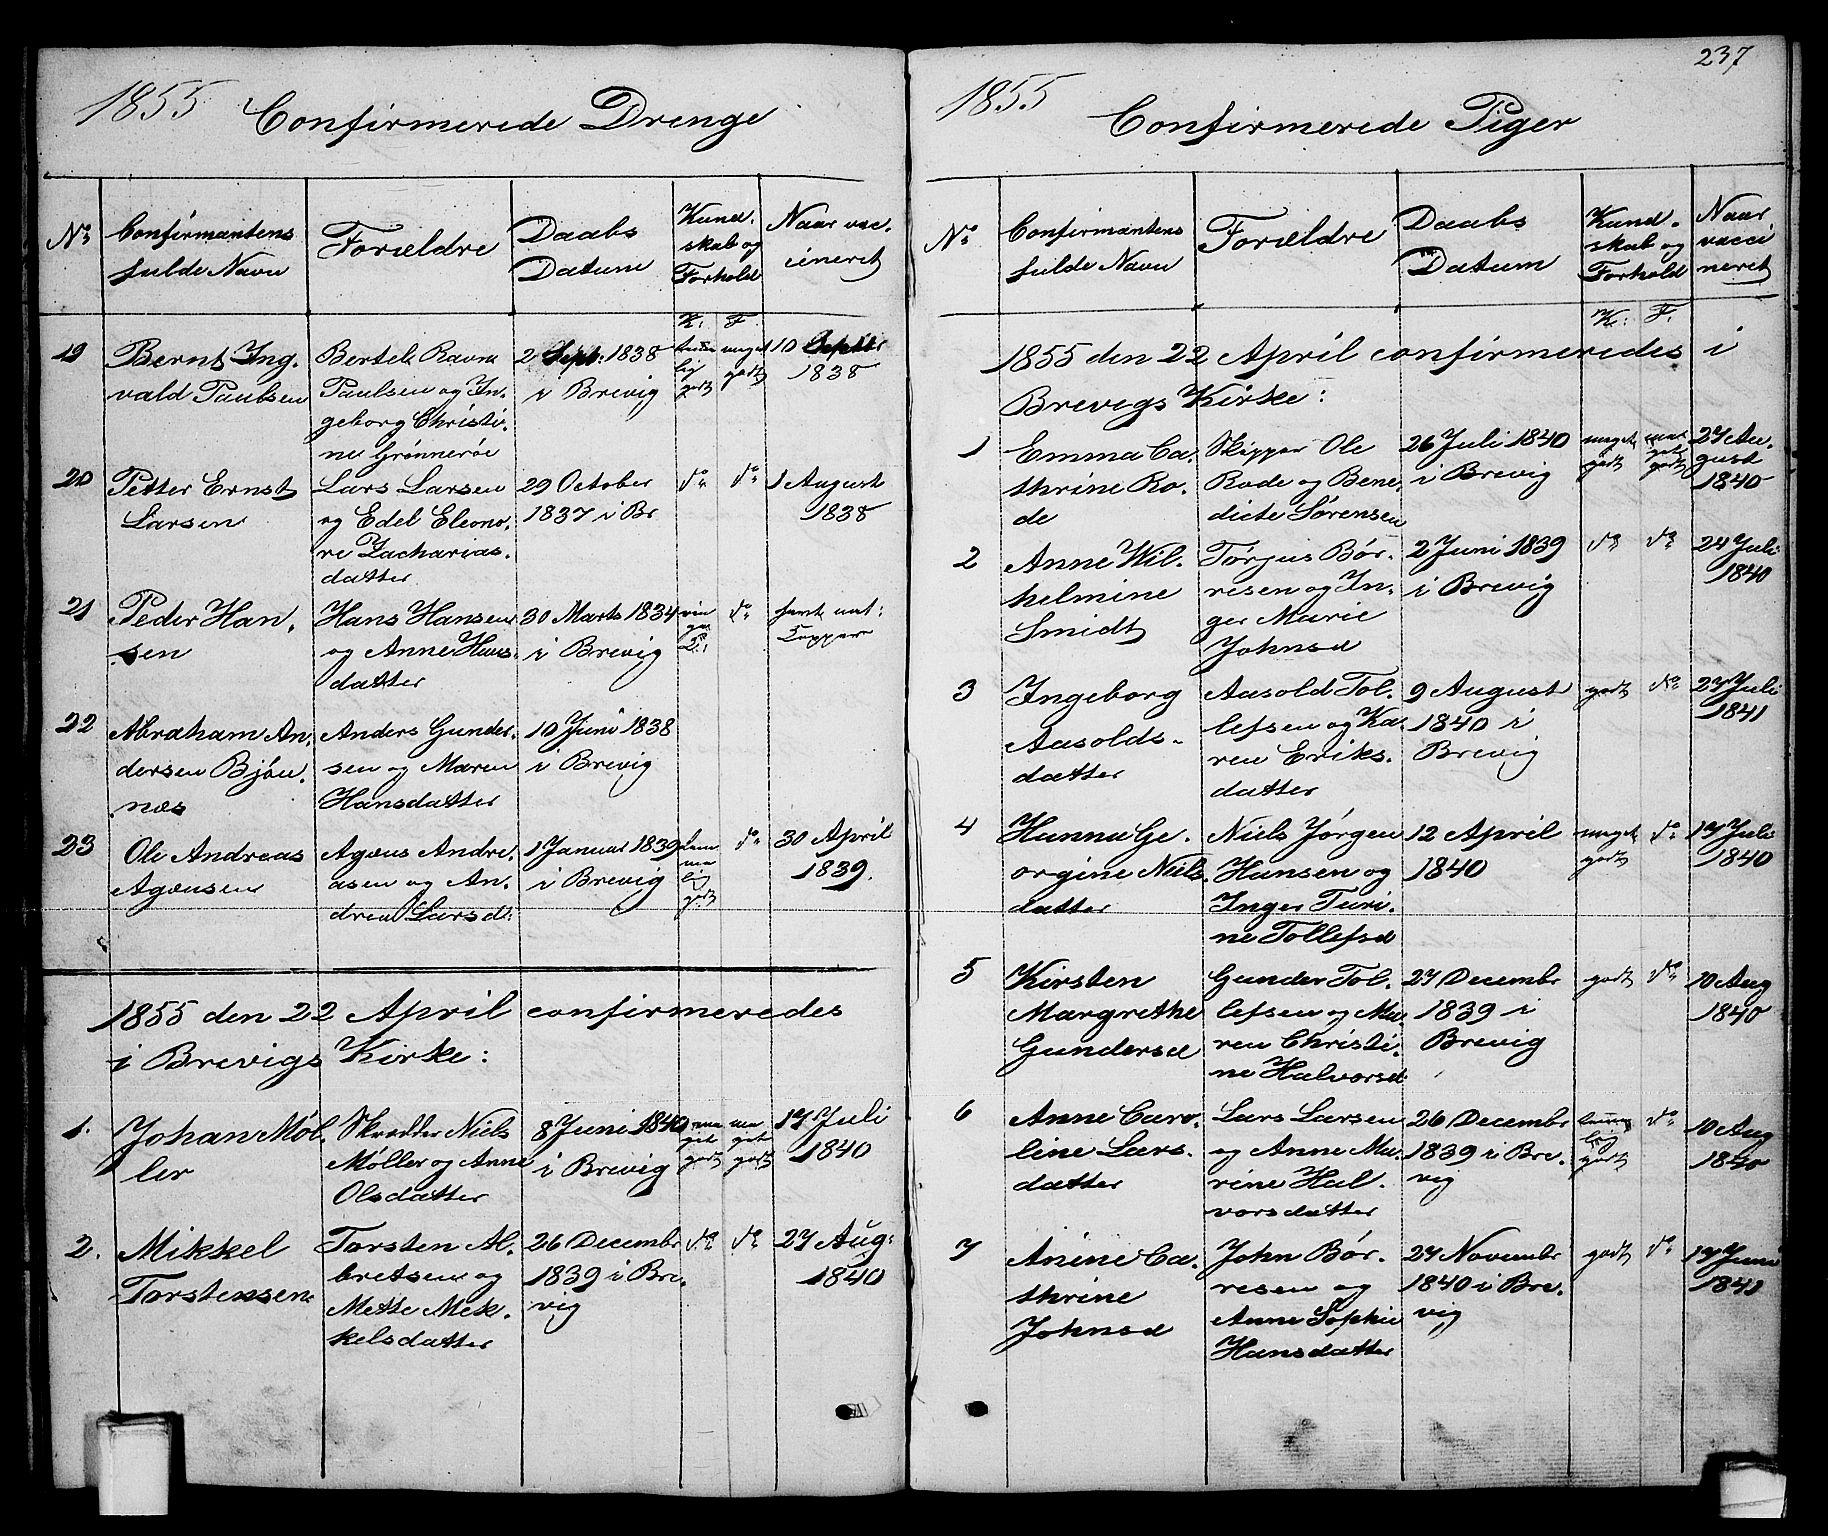 SAKO, Brevik kirkebøker, G/Ga/L0002: Klokkerbok nr. 2, 1846-1865, s. 237